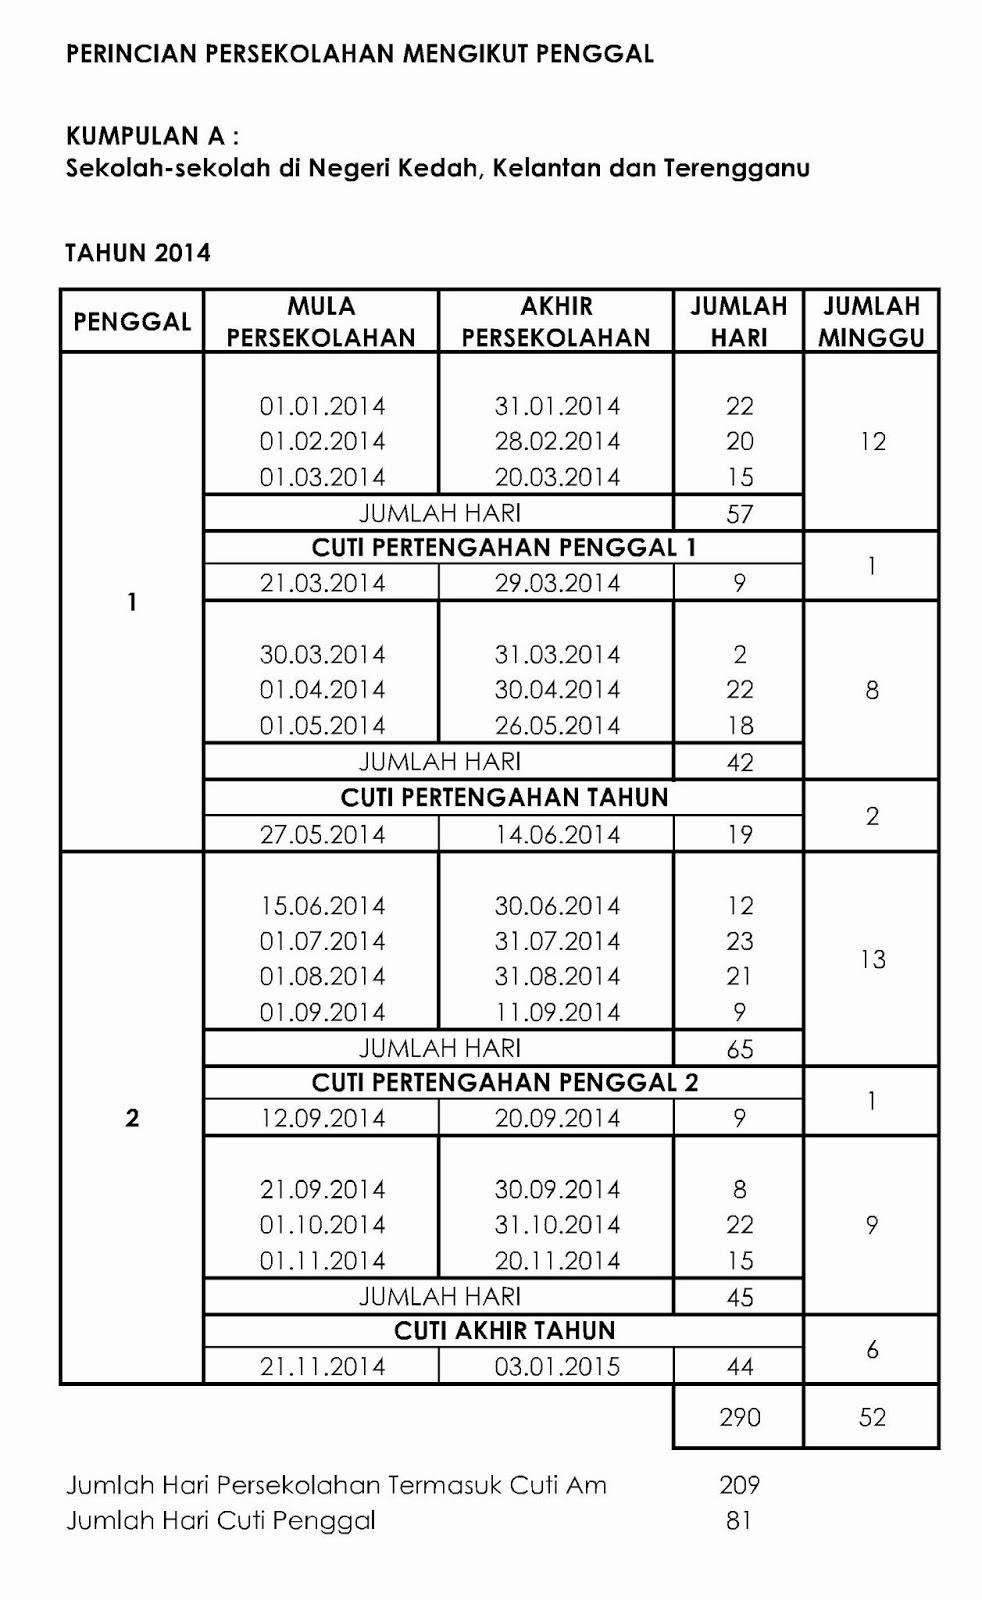 -public-holidays-2014.html for detailed Malaysian public holidays